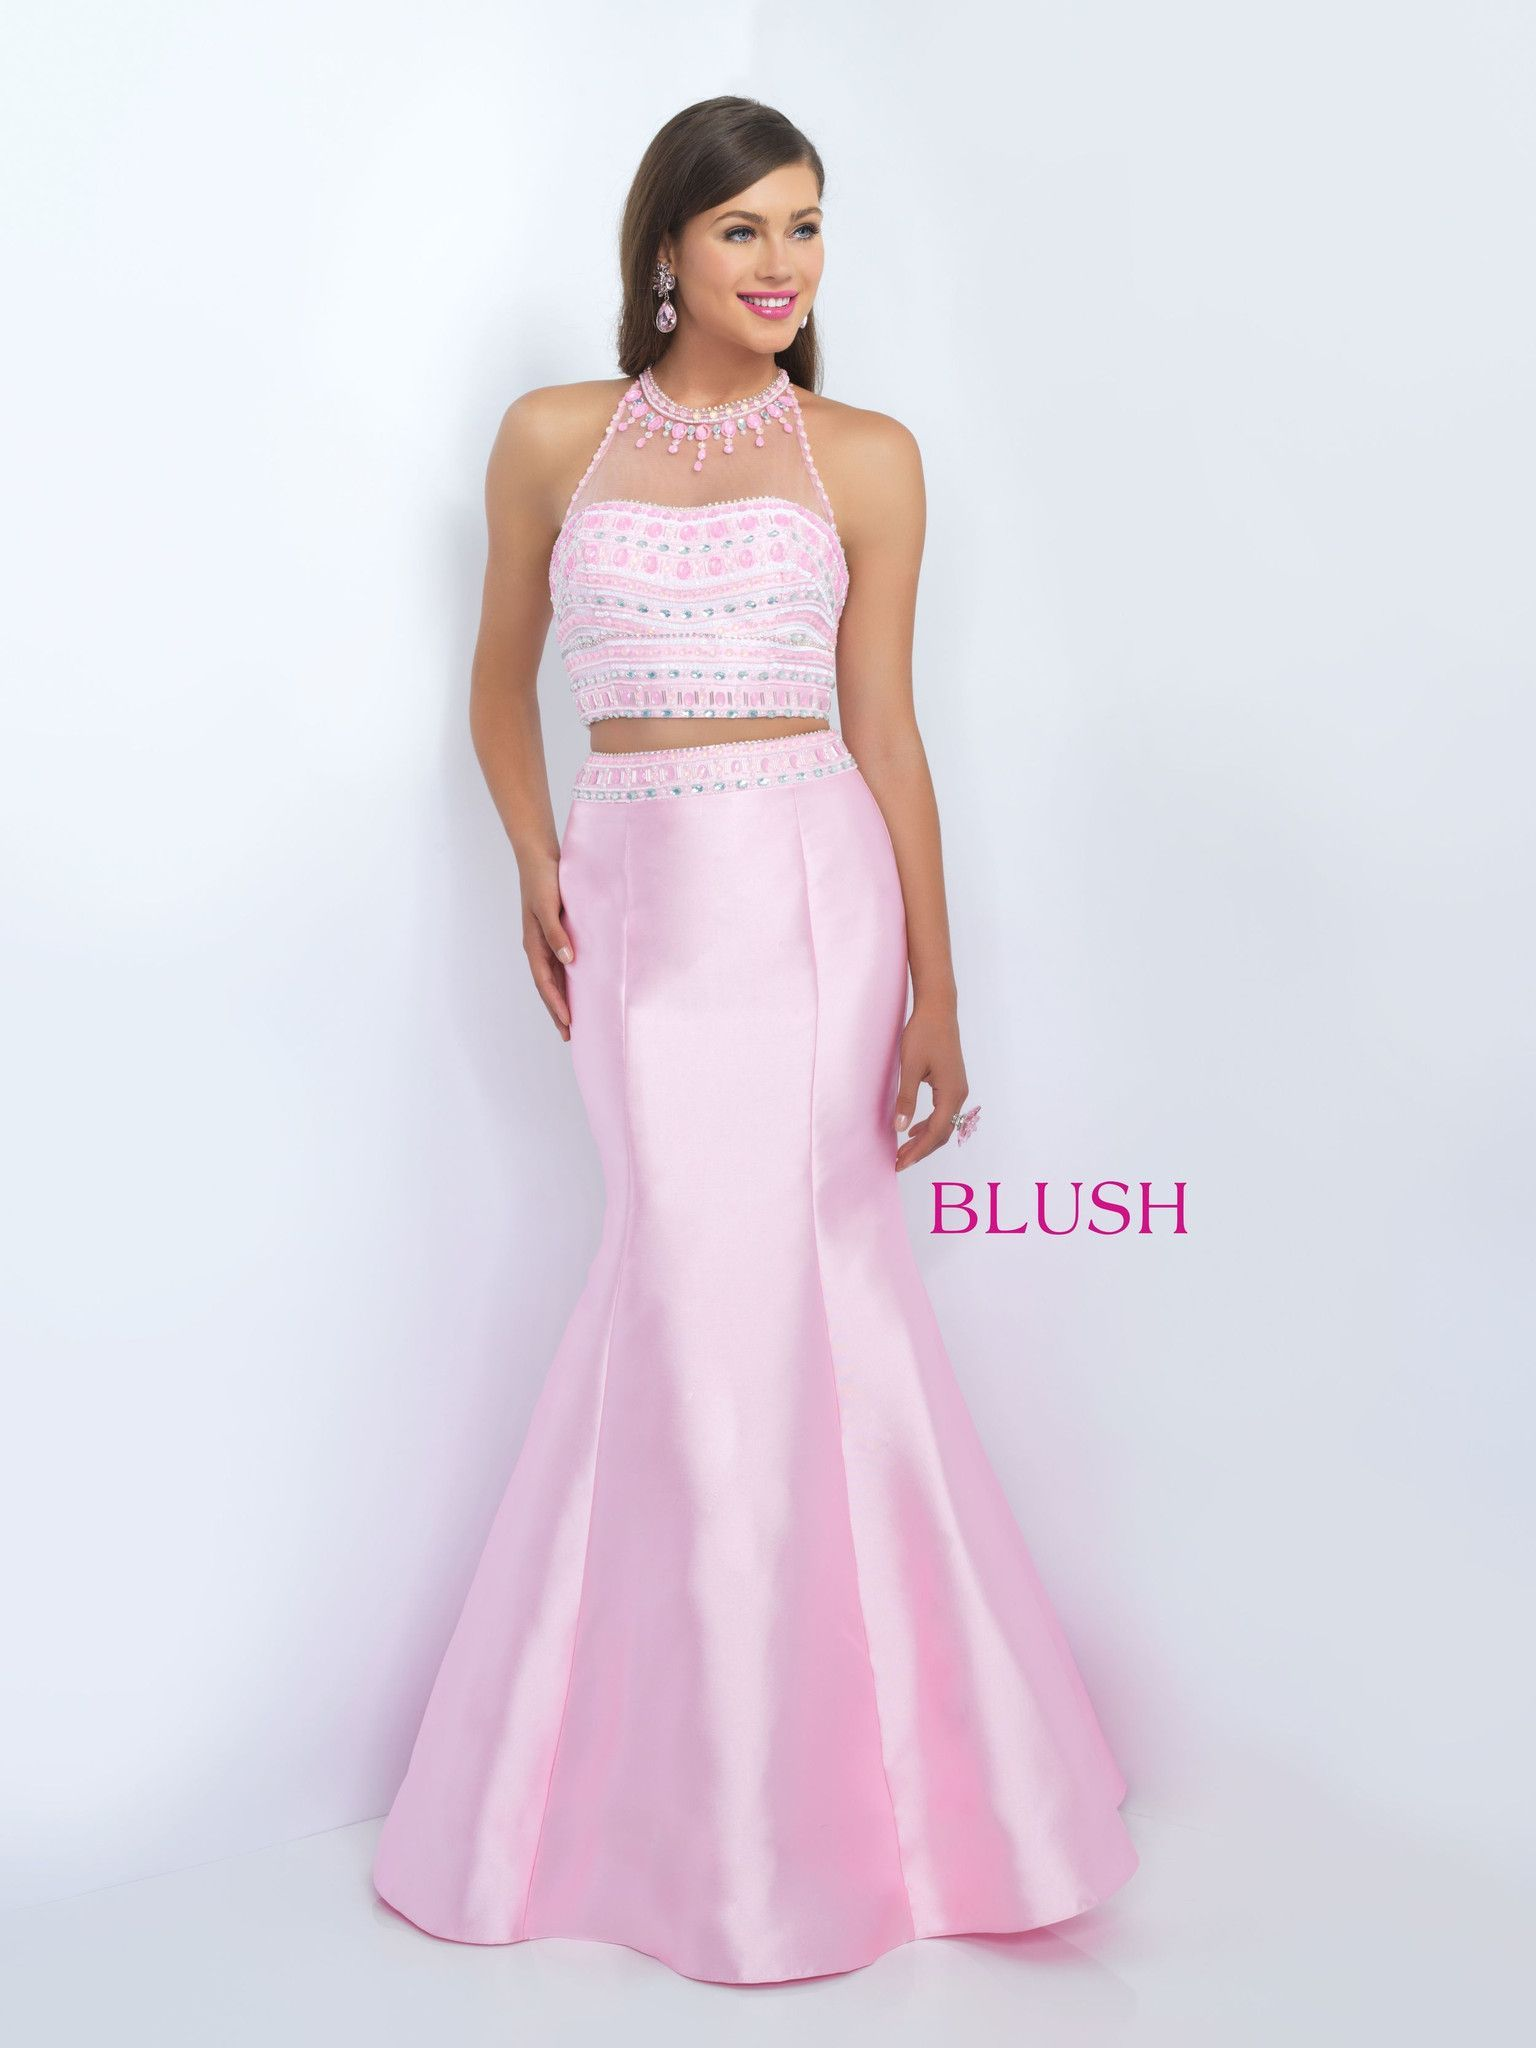 Blush prom bubblegum dresses pinterest blush prom and prom